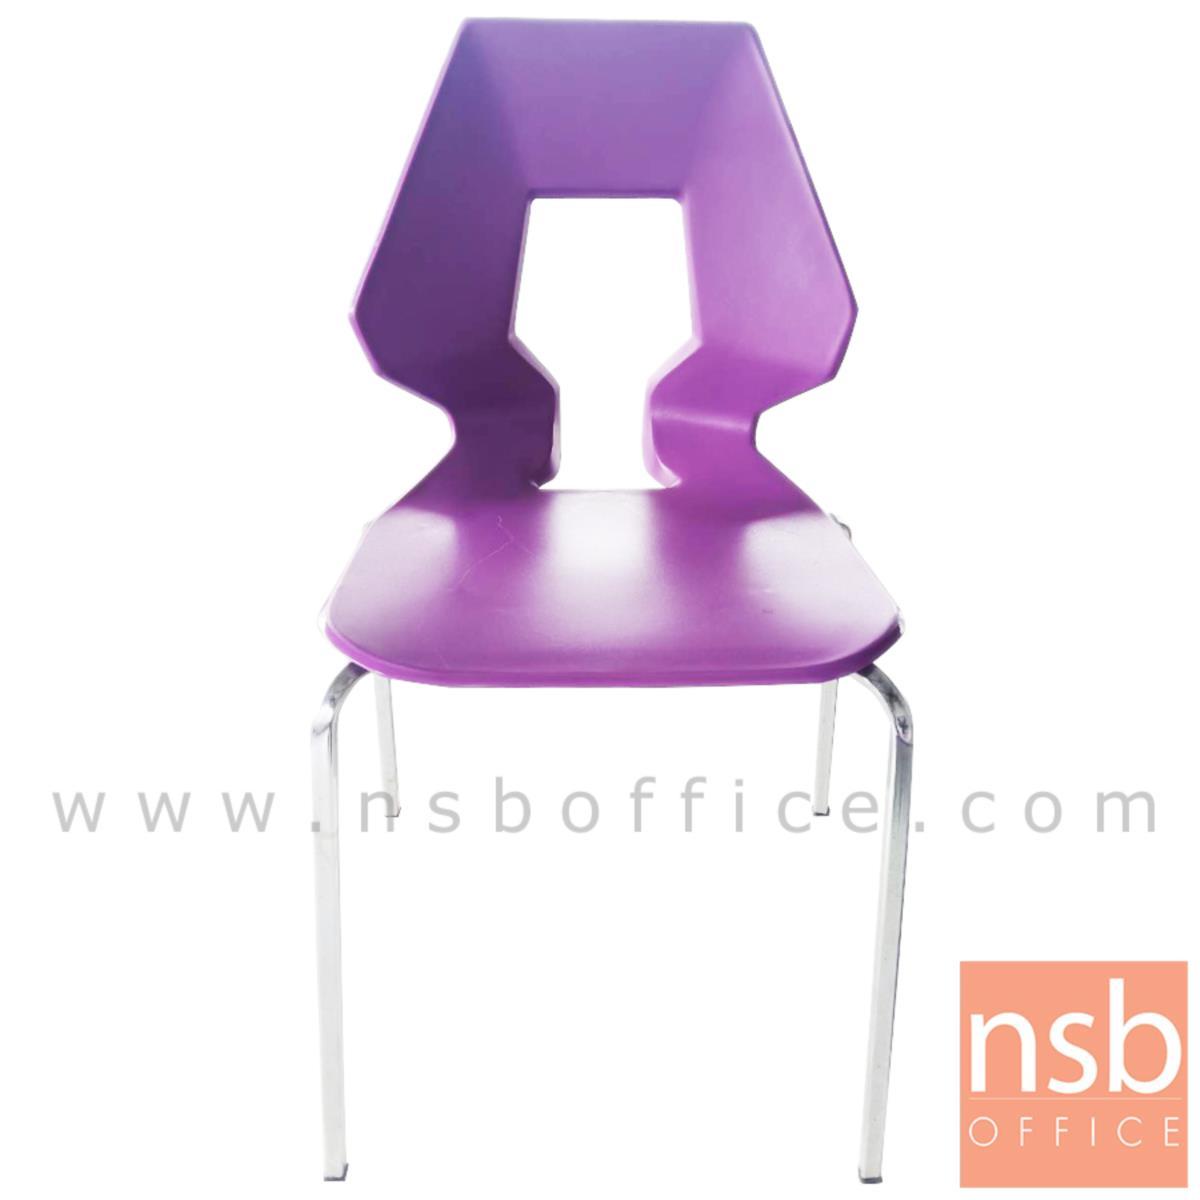 B05A065:เก้าอี้อเนกประสงค์เฟรมโพลี่ รุ่น B128  ขาเหล็กตันชุบโครเมี่ยม